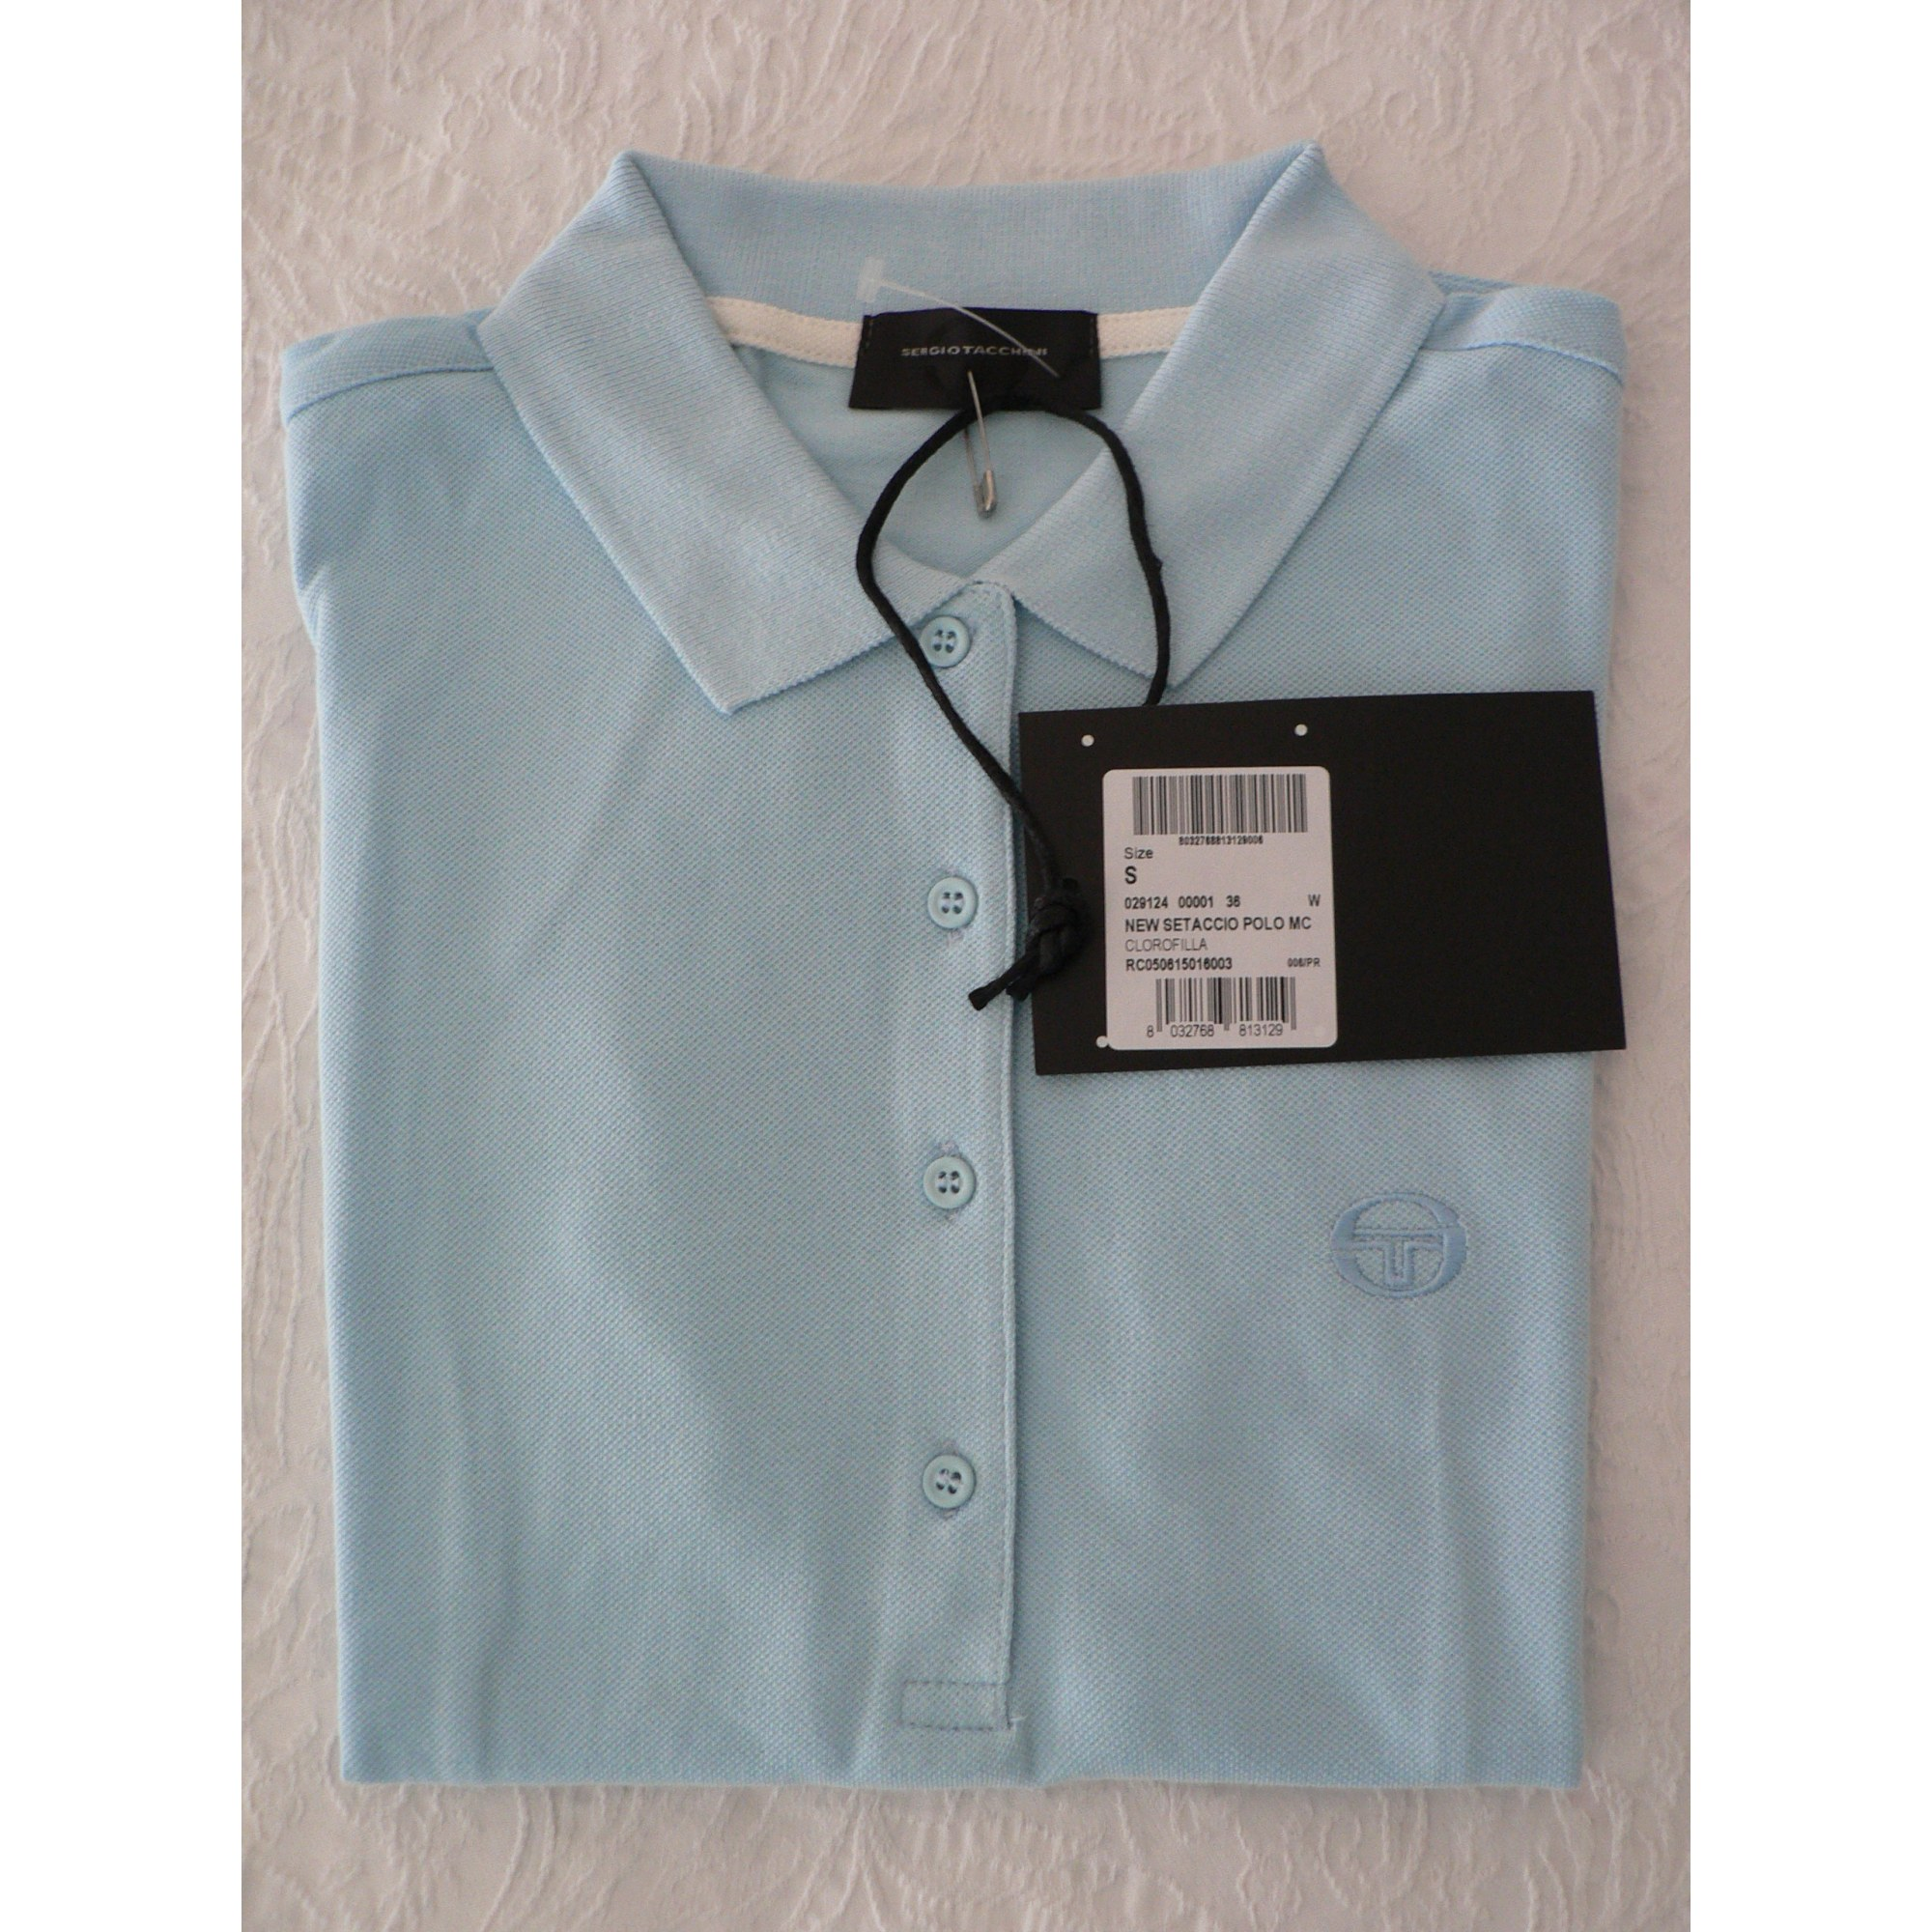 Polo SERGIO TACCHINI Bleu, bleu marine, bleu turquoise